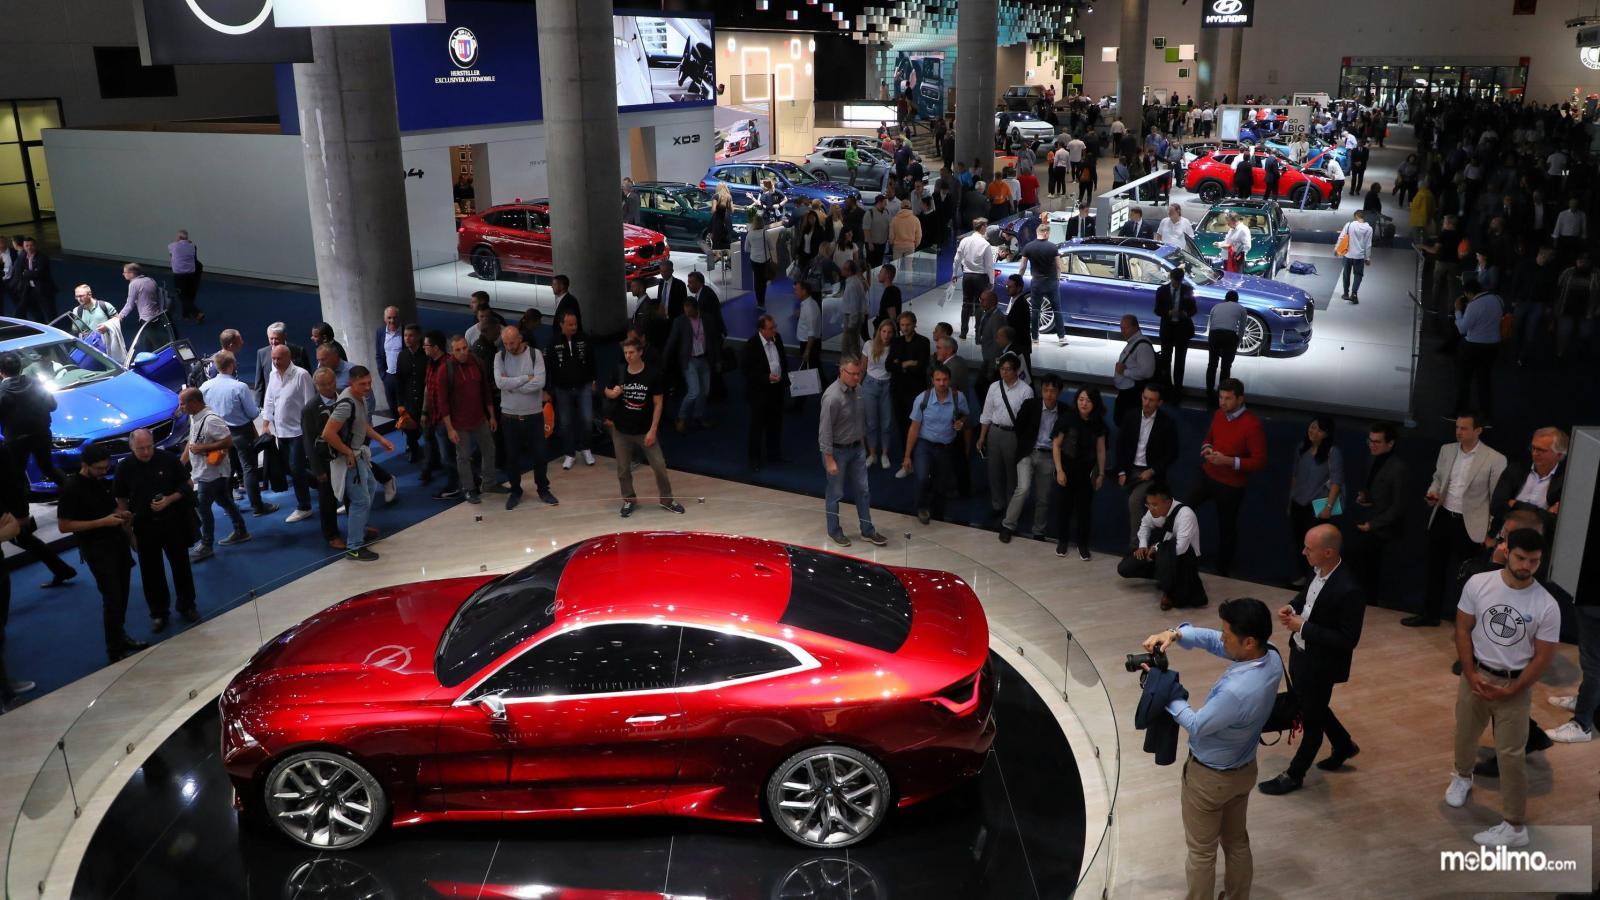 Foto menunjukkan suasana di pameran Frankfurt Motor Show 2019